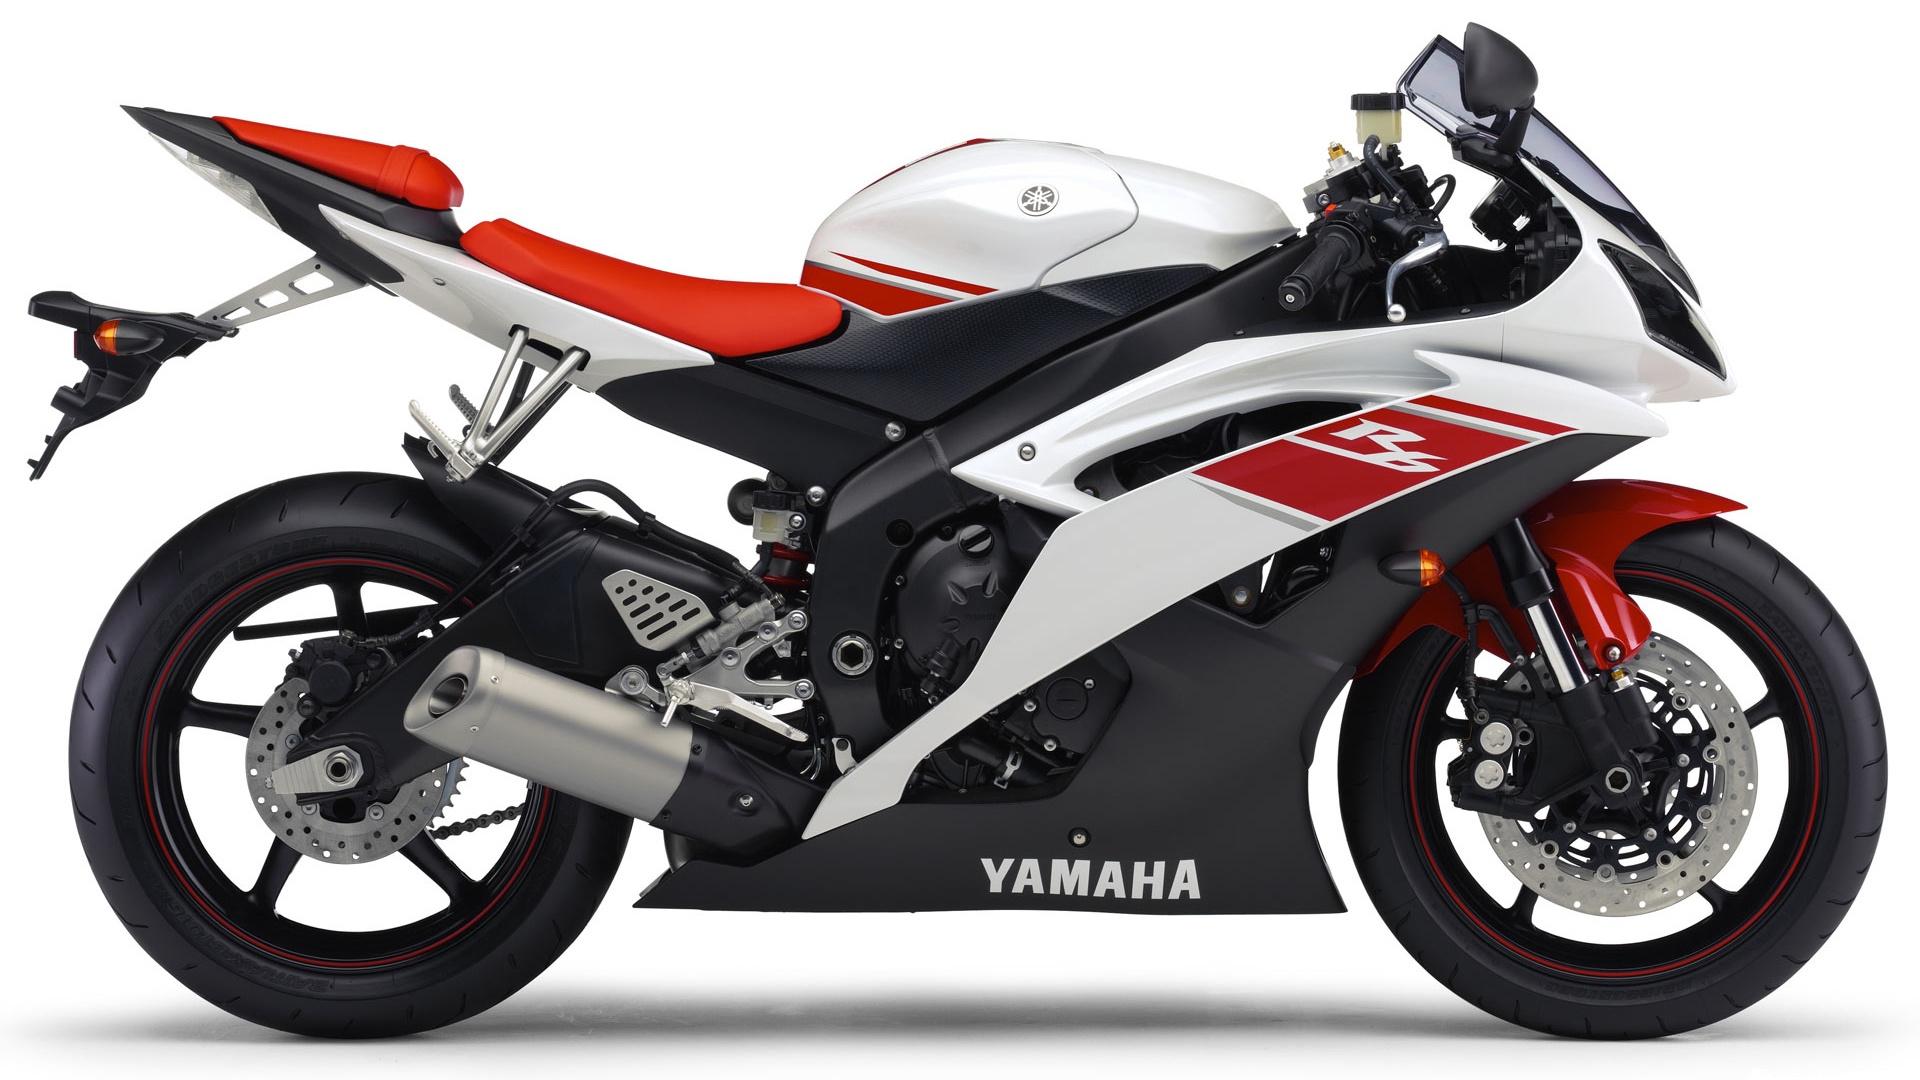 Wallpaper download bike - Yamaha R6 Bike